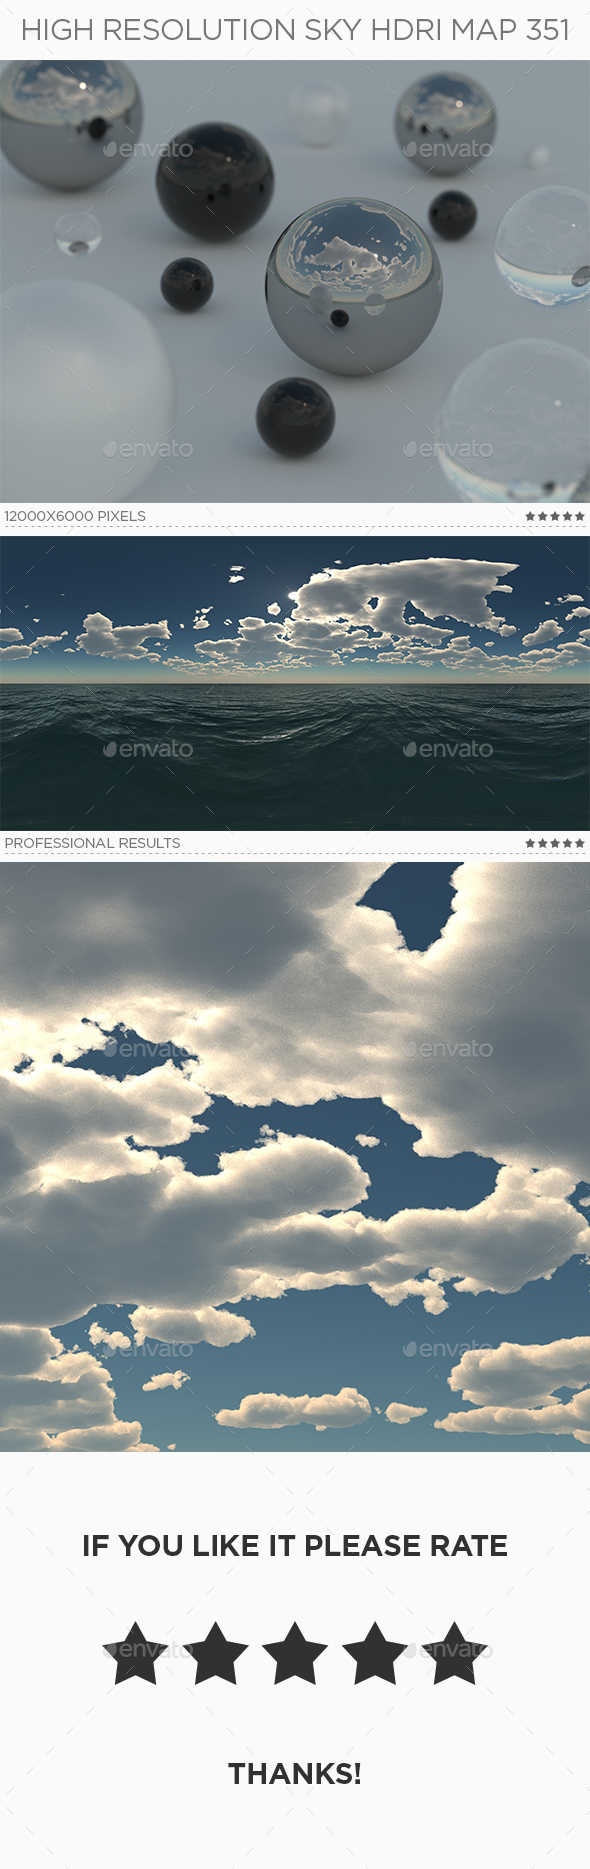 High Resolution Sky HDRi Map 351 - 3DOcean Item for Sale